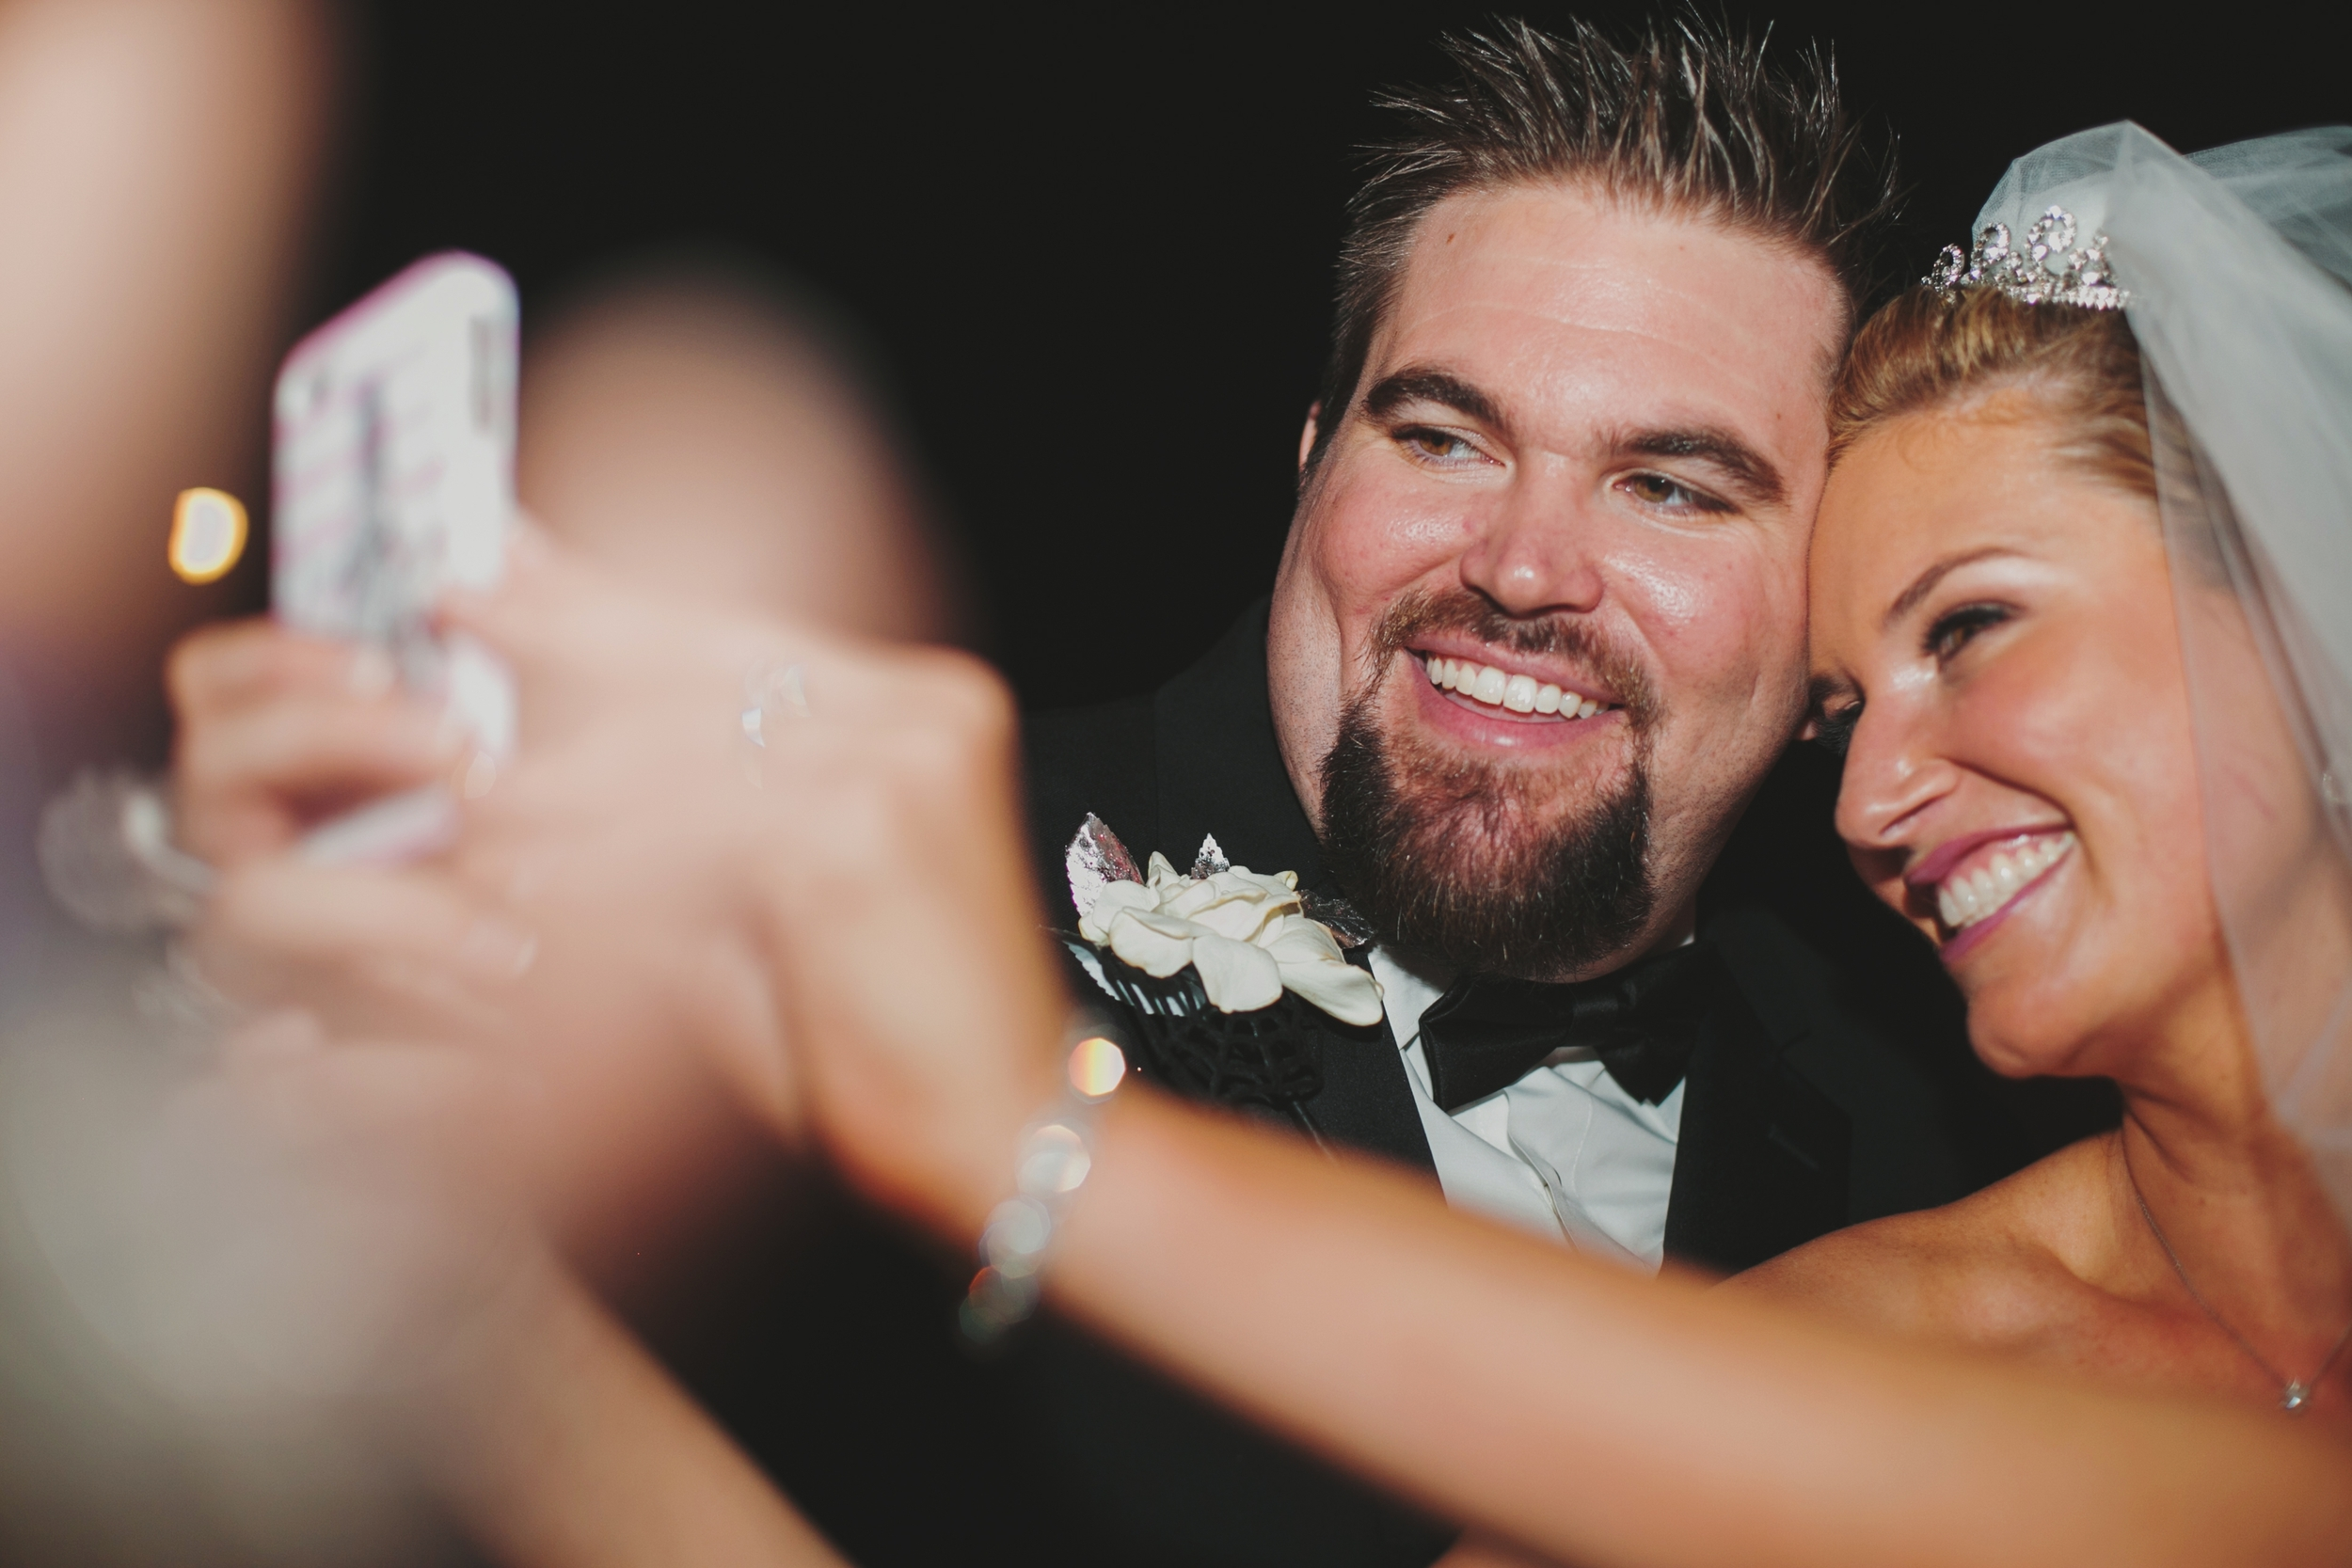 The-Suitcase-Studio-Timree-Matt-Lifestyle-Wedding-Photographer-109.jpg